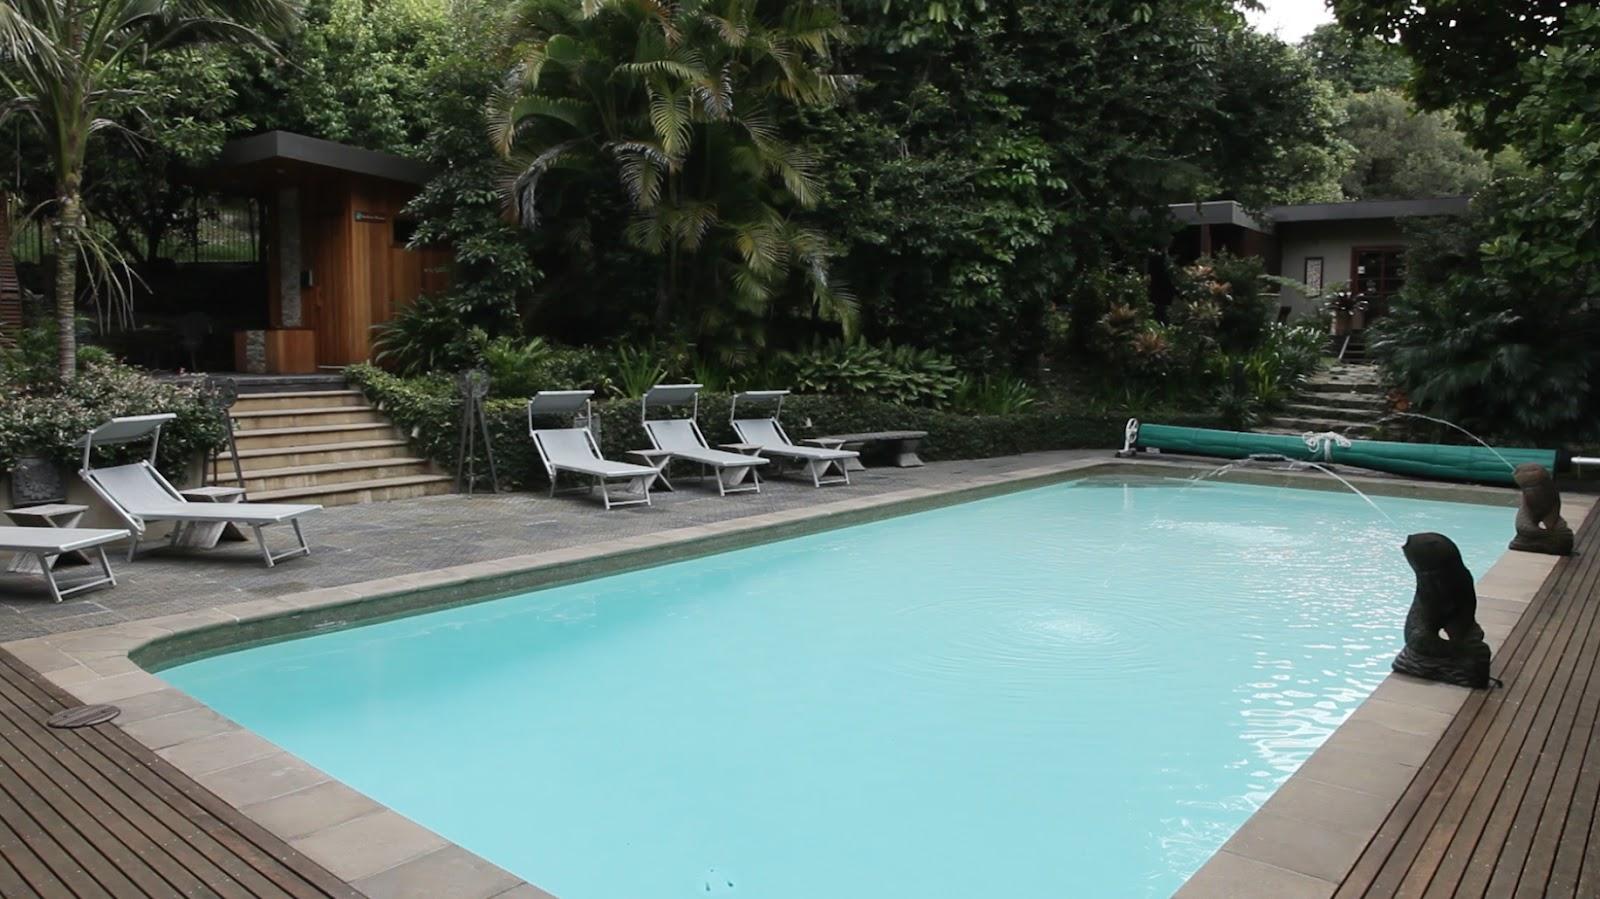 gaia retreat spa byron bay hinterland retreat me tv. Black Bedroom Furniture Sets. Home Design Ideas